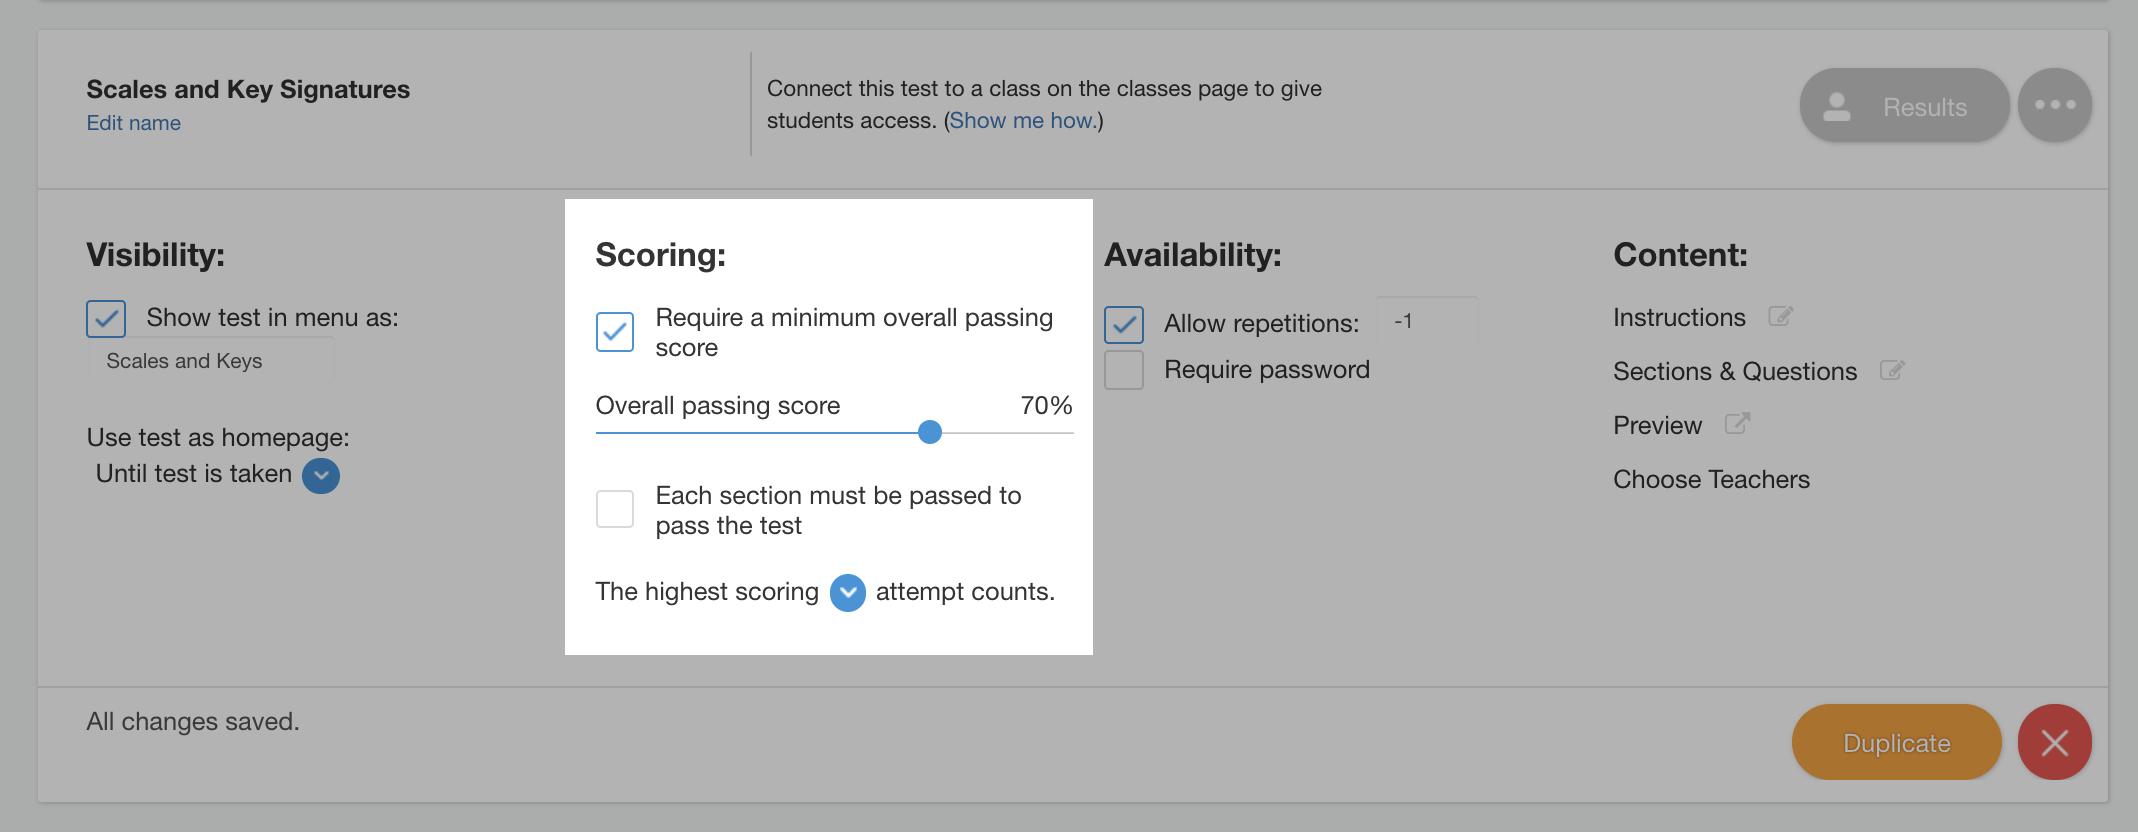 test scoring options